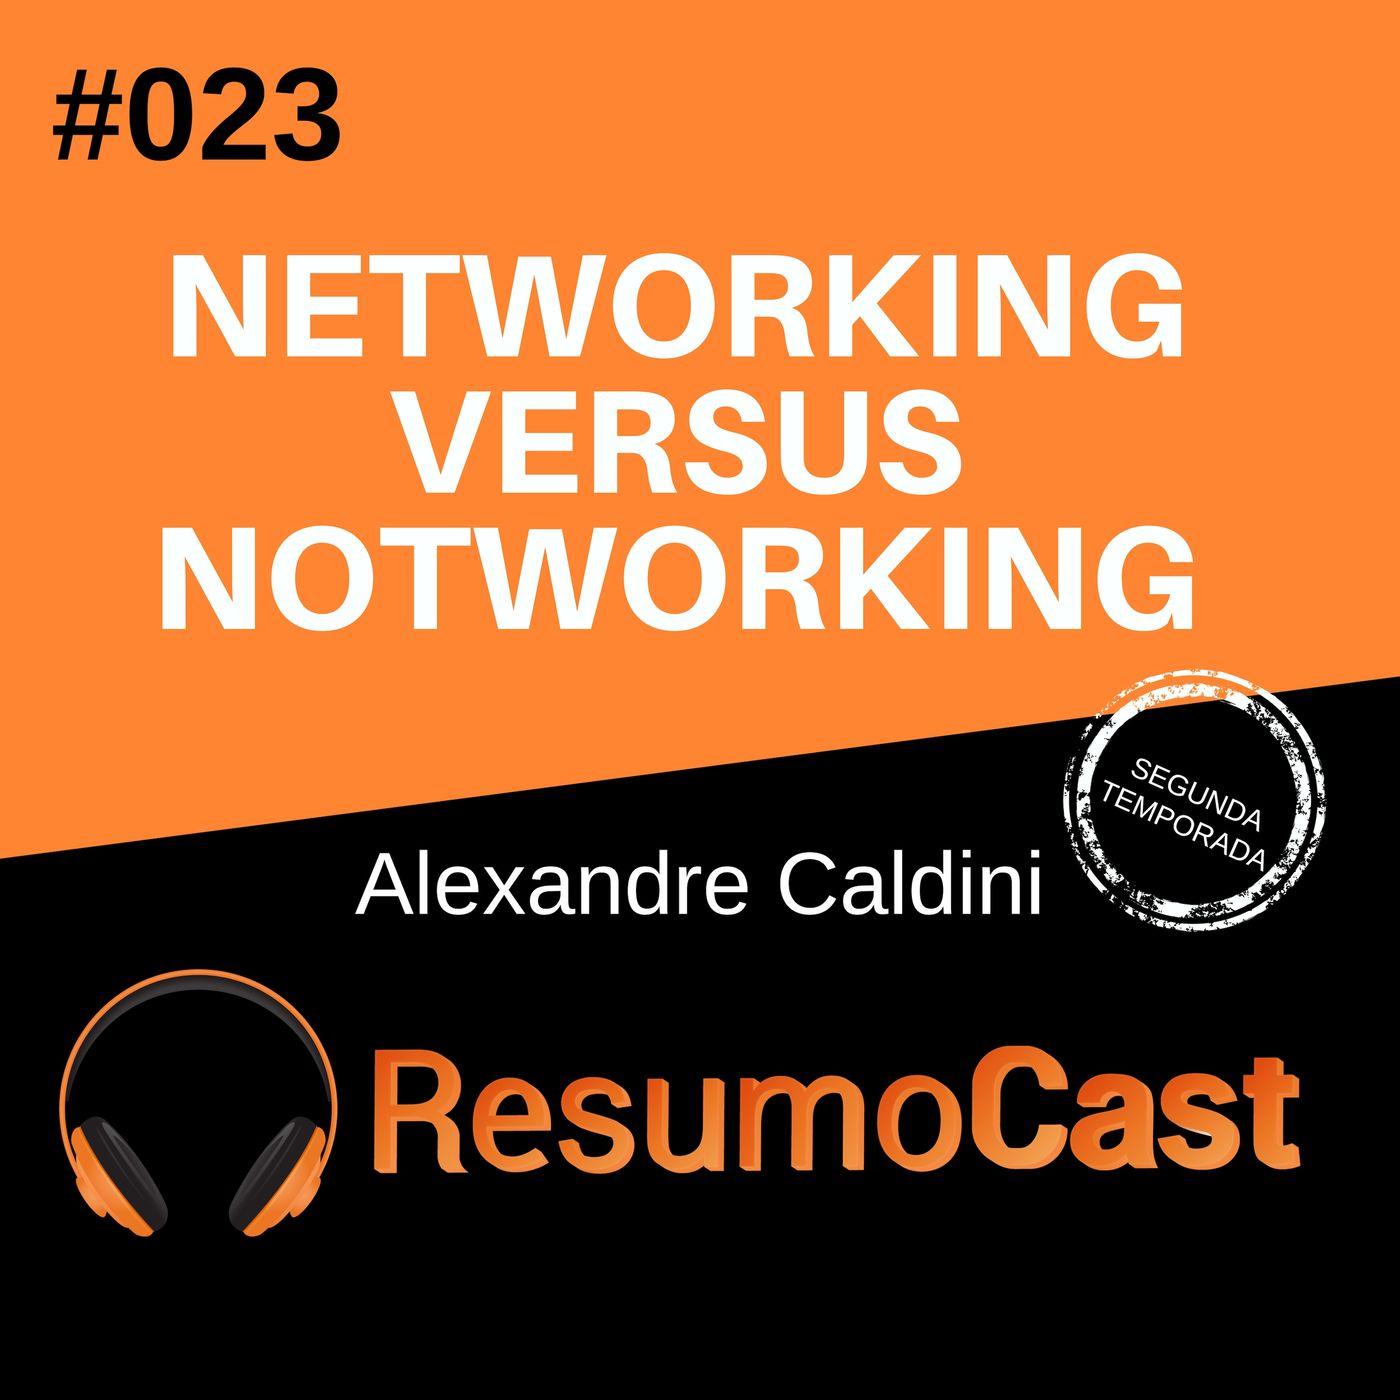 T2#23 Networking versus notworking | Alexandre Caldini